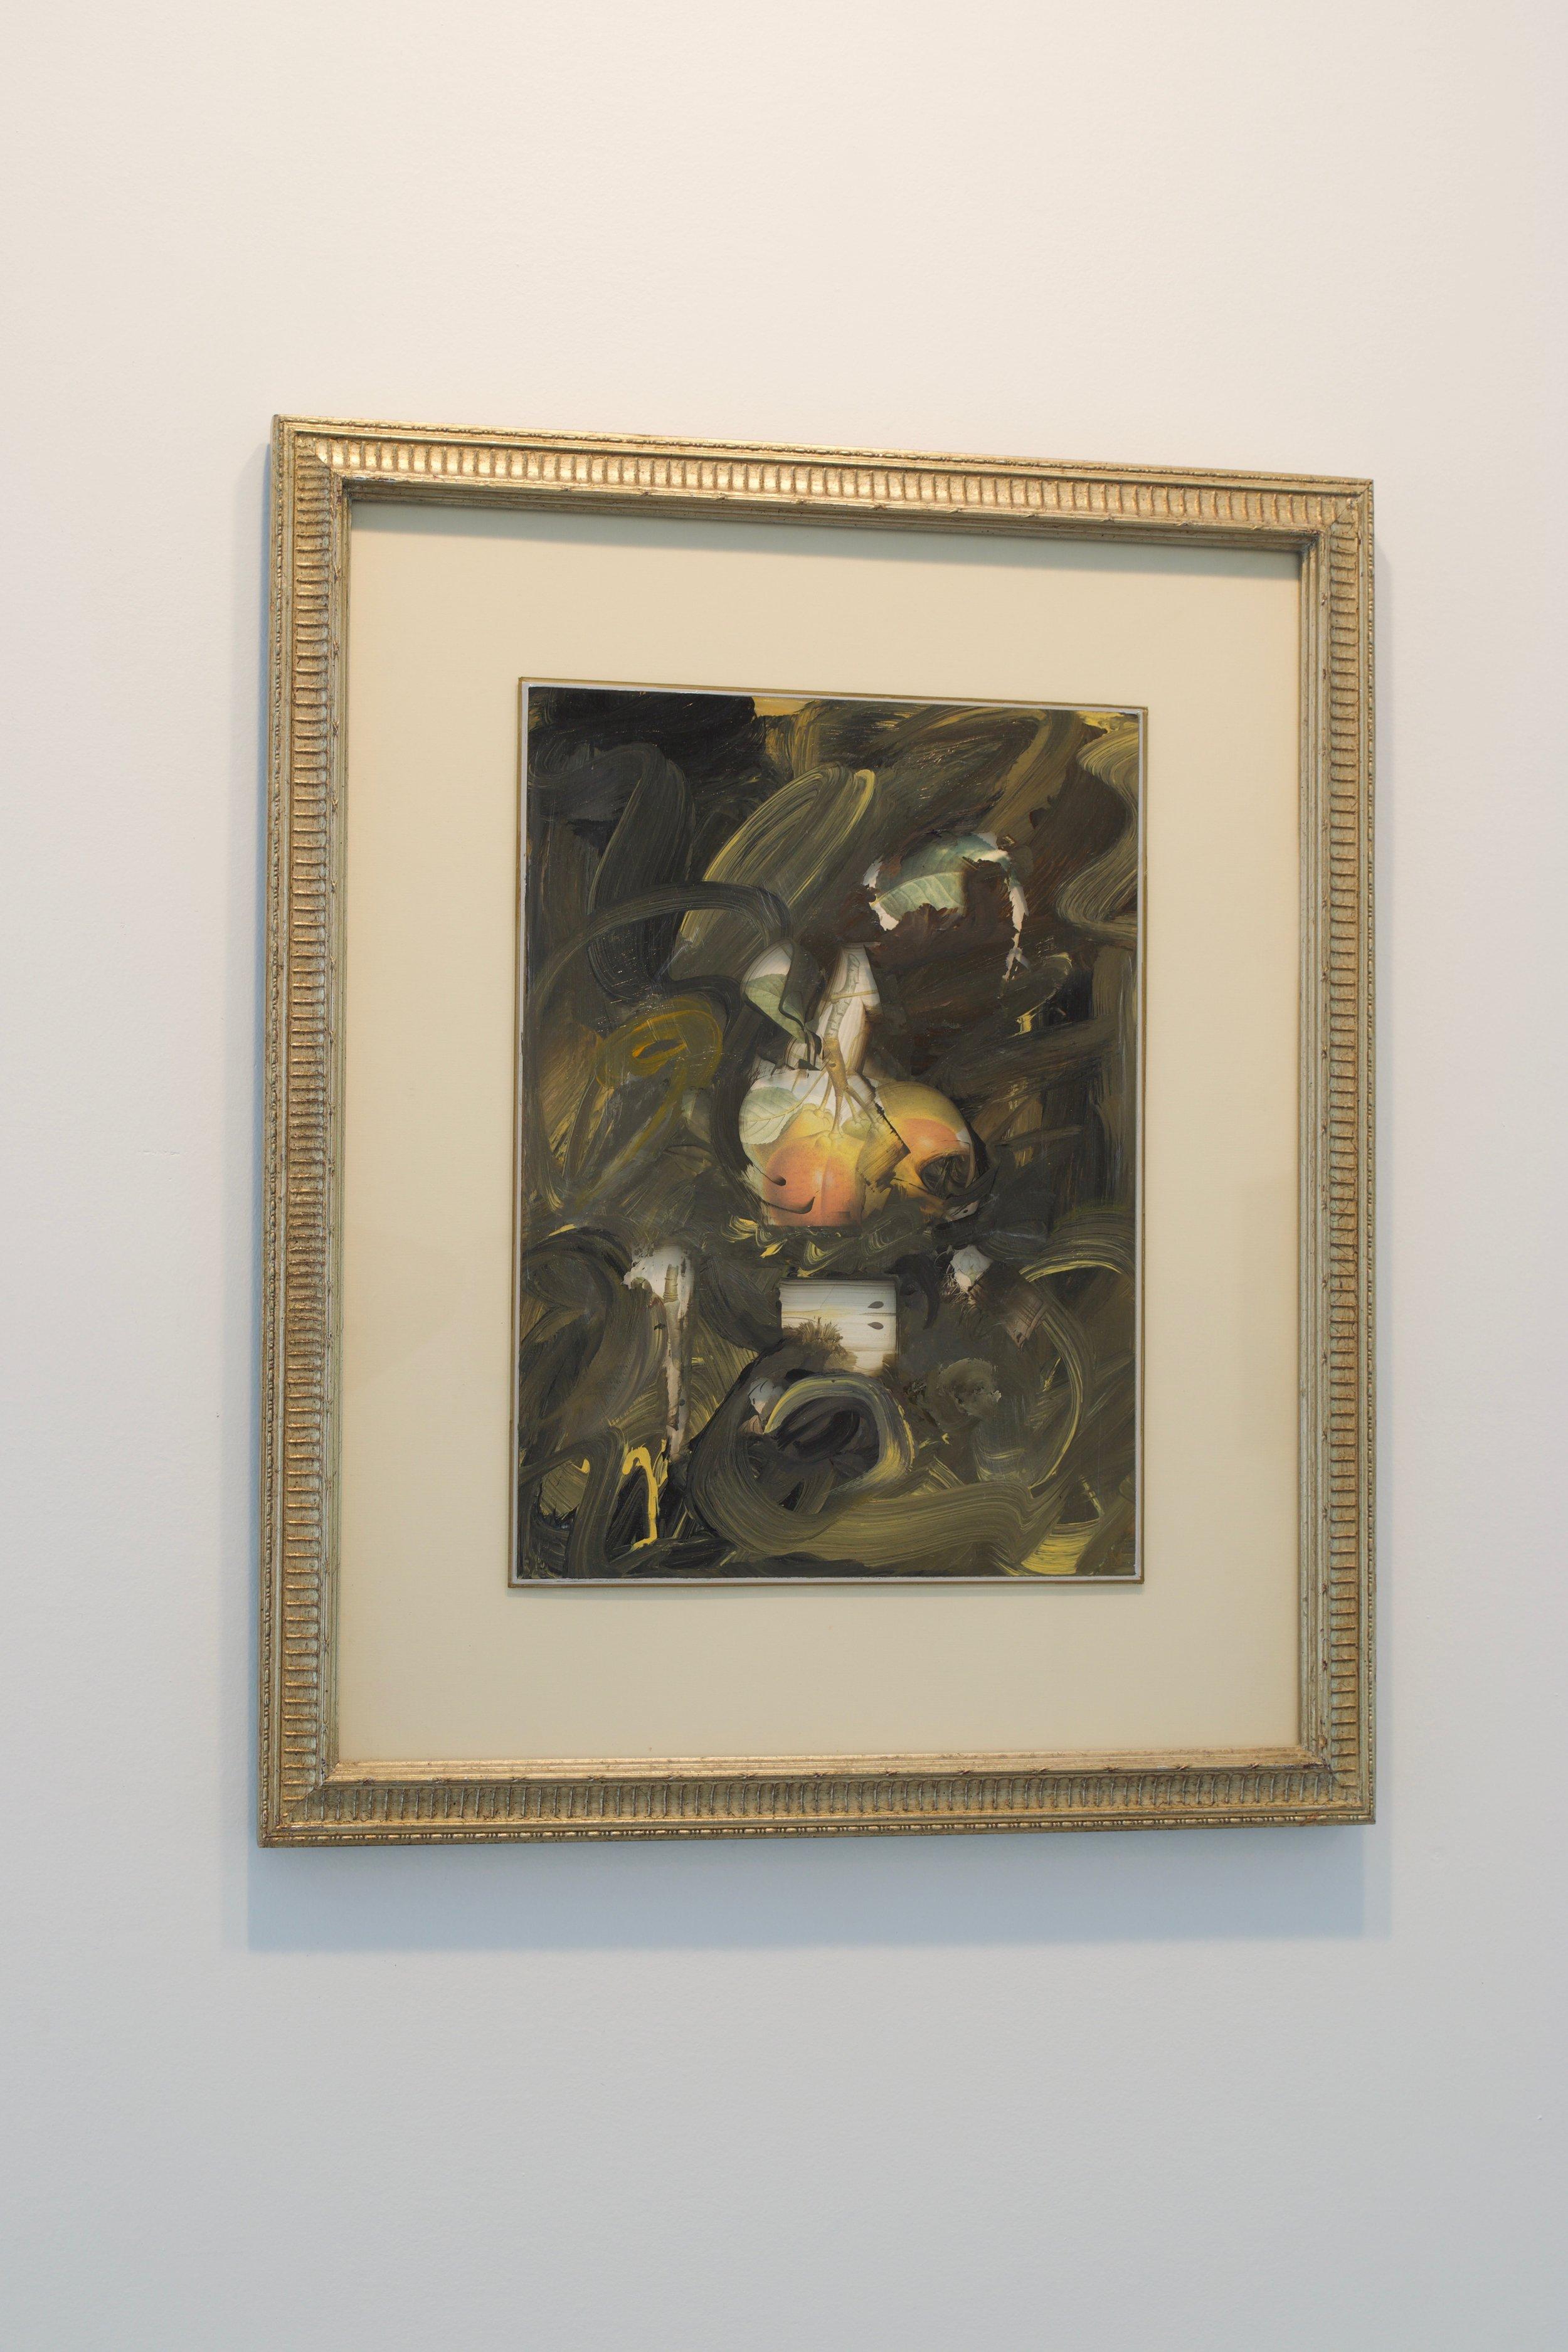 Mark Van Wagner, 2007. Acrylic on glass over botanical print, 22x18 in.